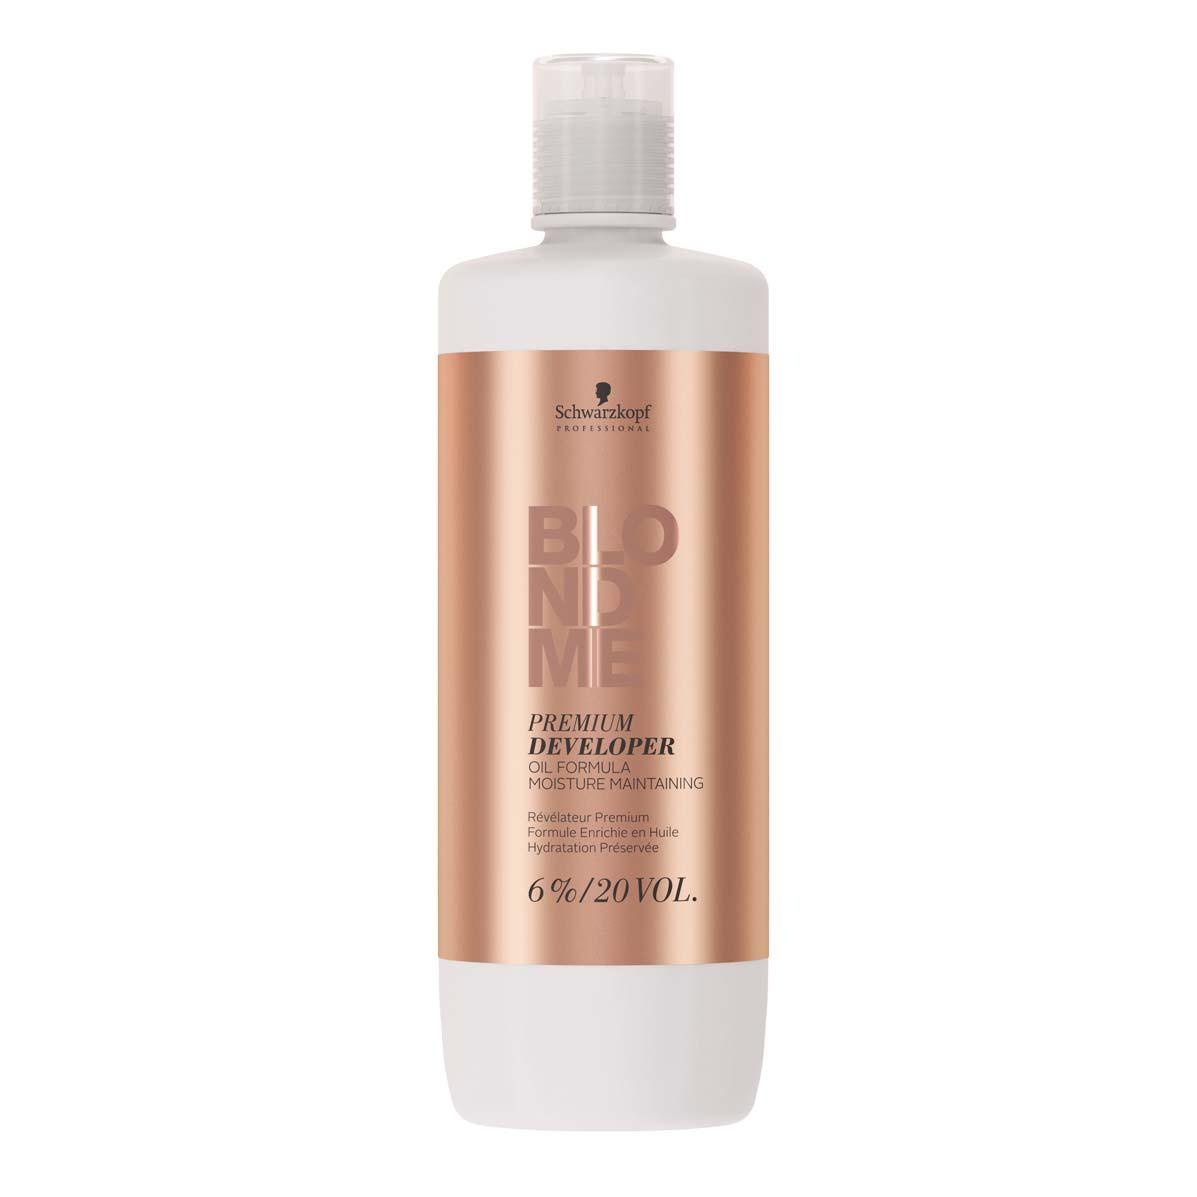 Schwarzkopf Professional BlondMe Loção Ativadora Premium 6% 20Vol 1000ml